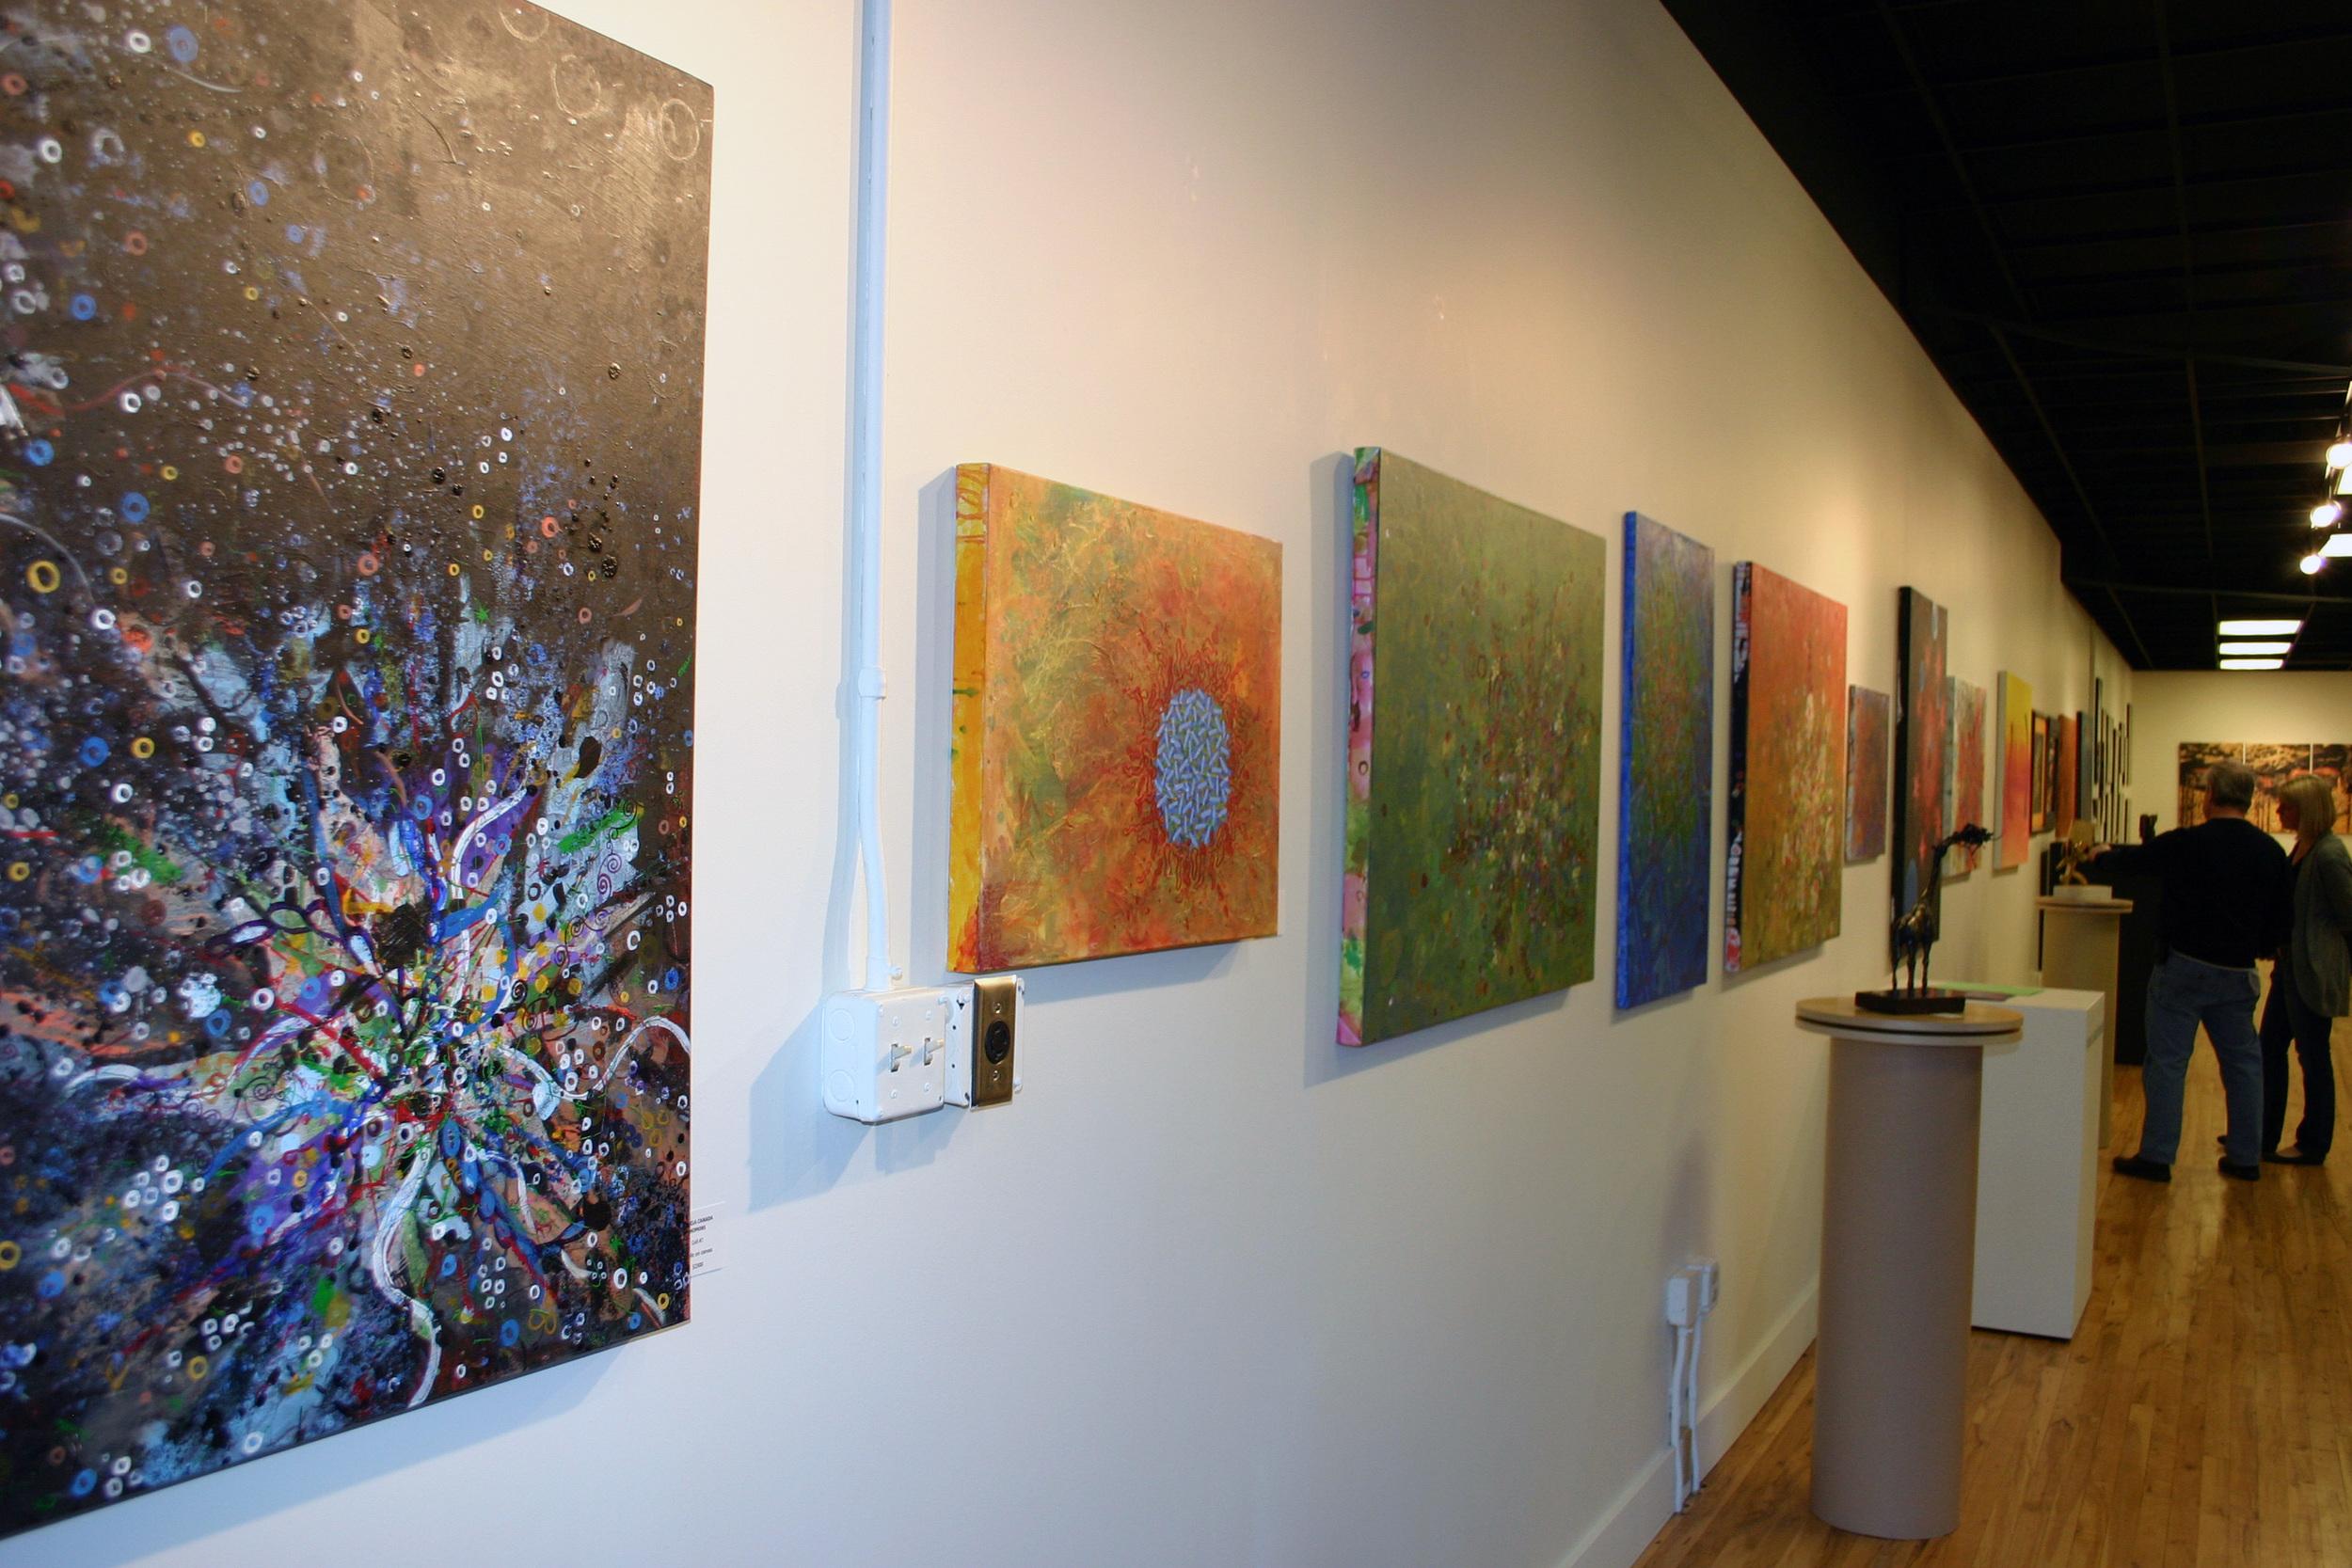 Art show in Santa Fe art district, Denver, CO